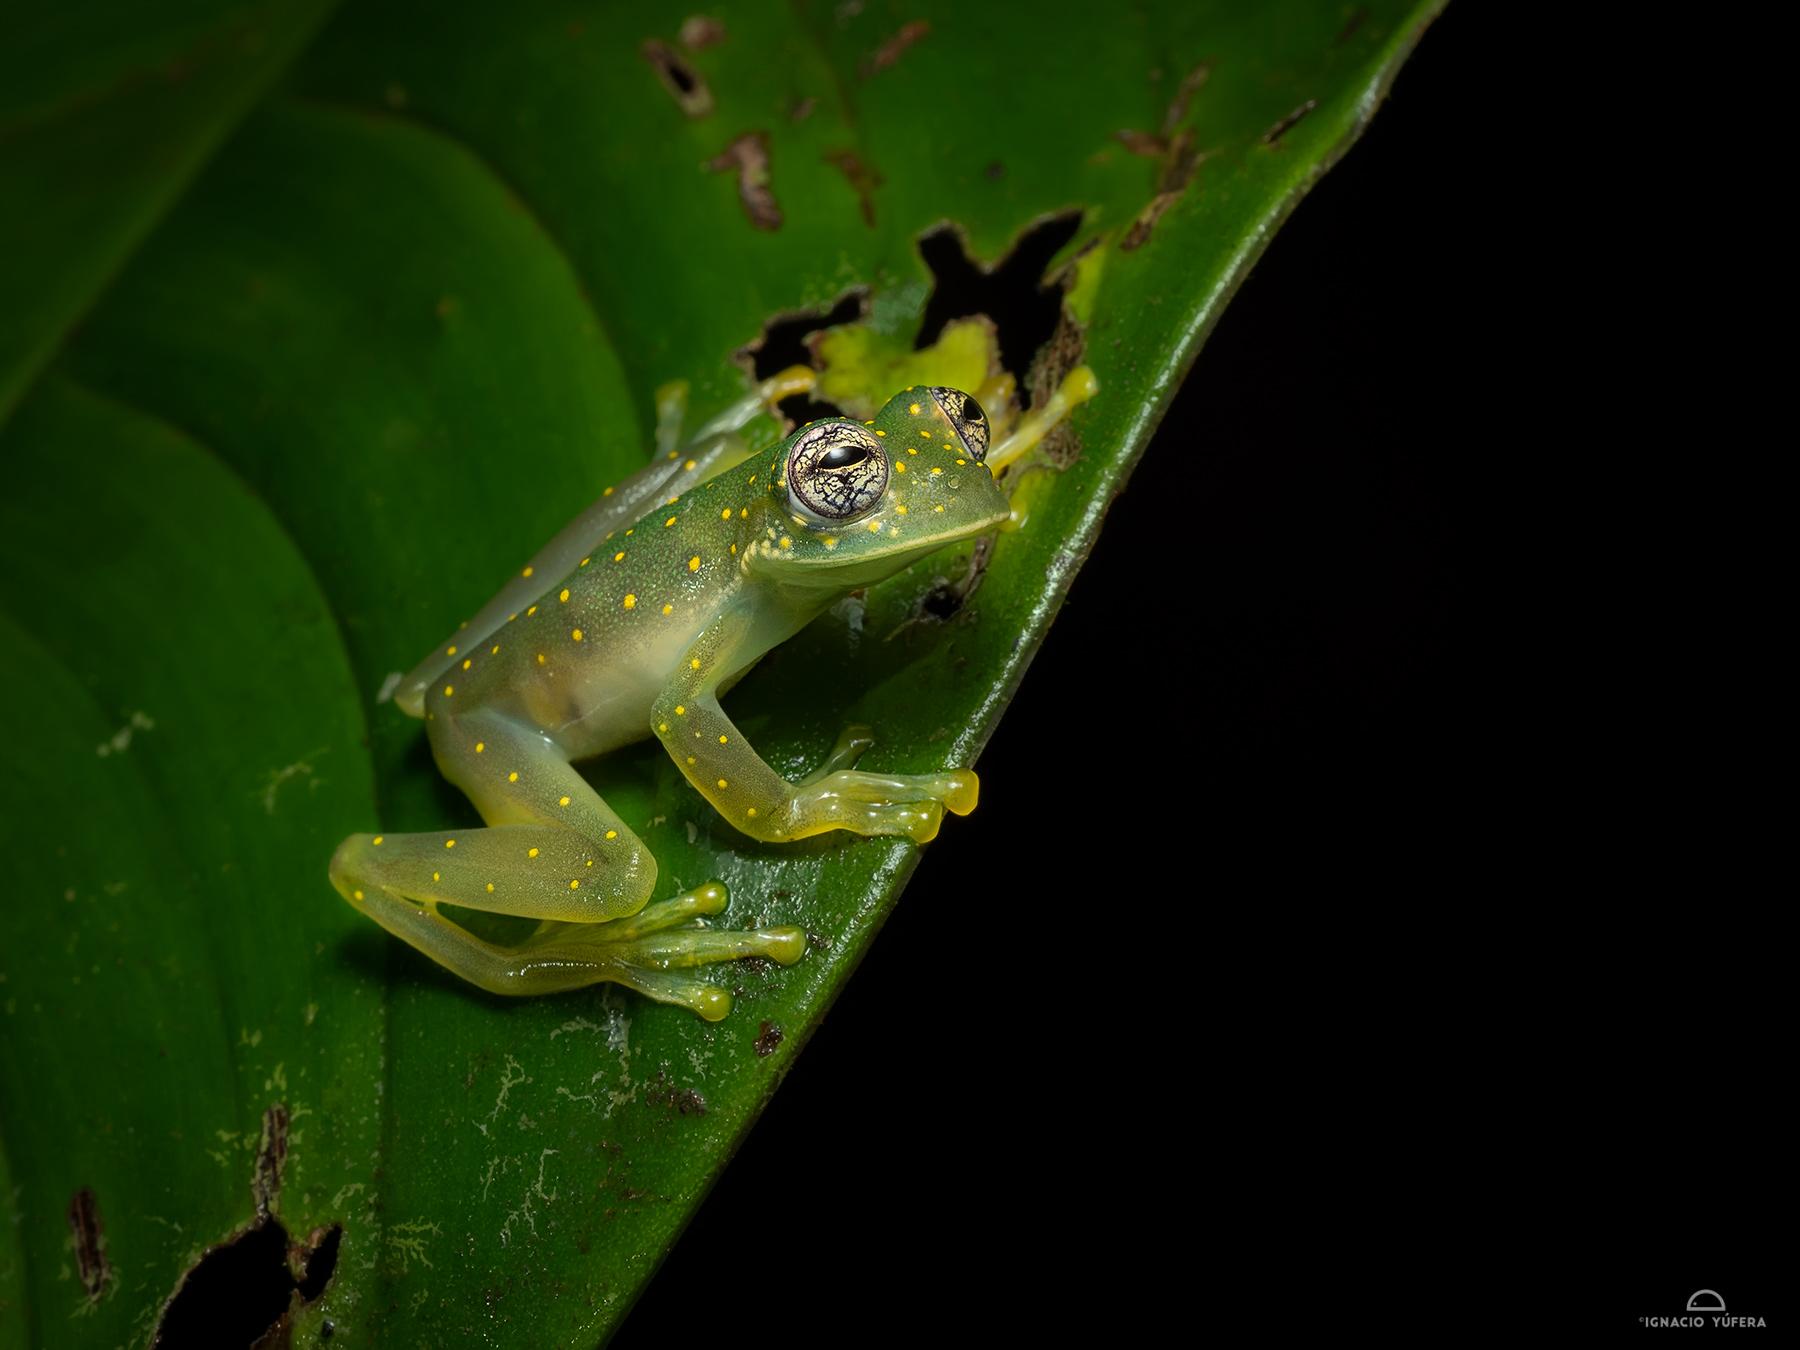 Cascade Glass Frog (Sachatamia albomaculata), Nusagandi, Panama, July